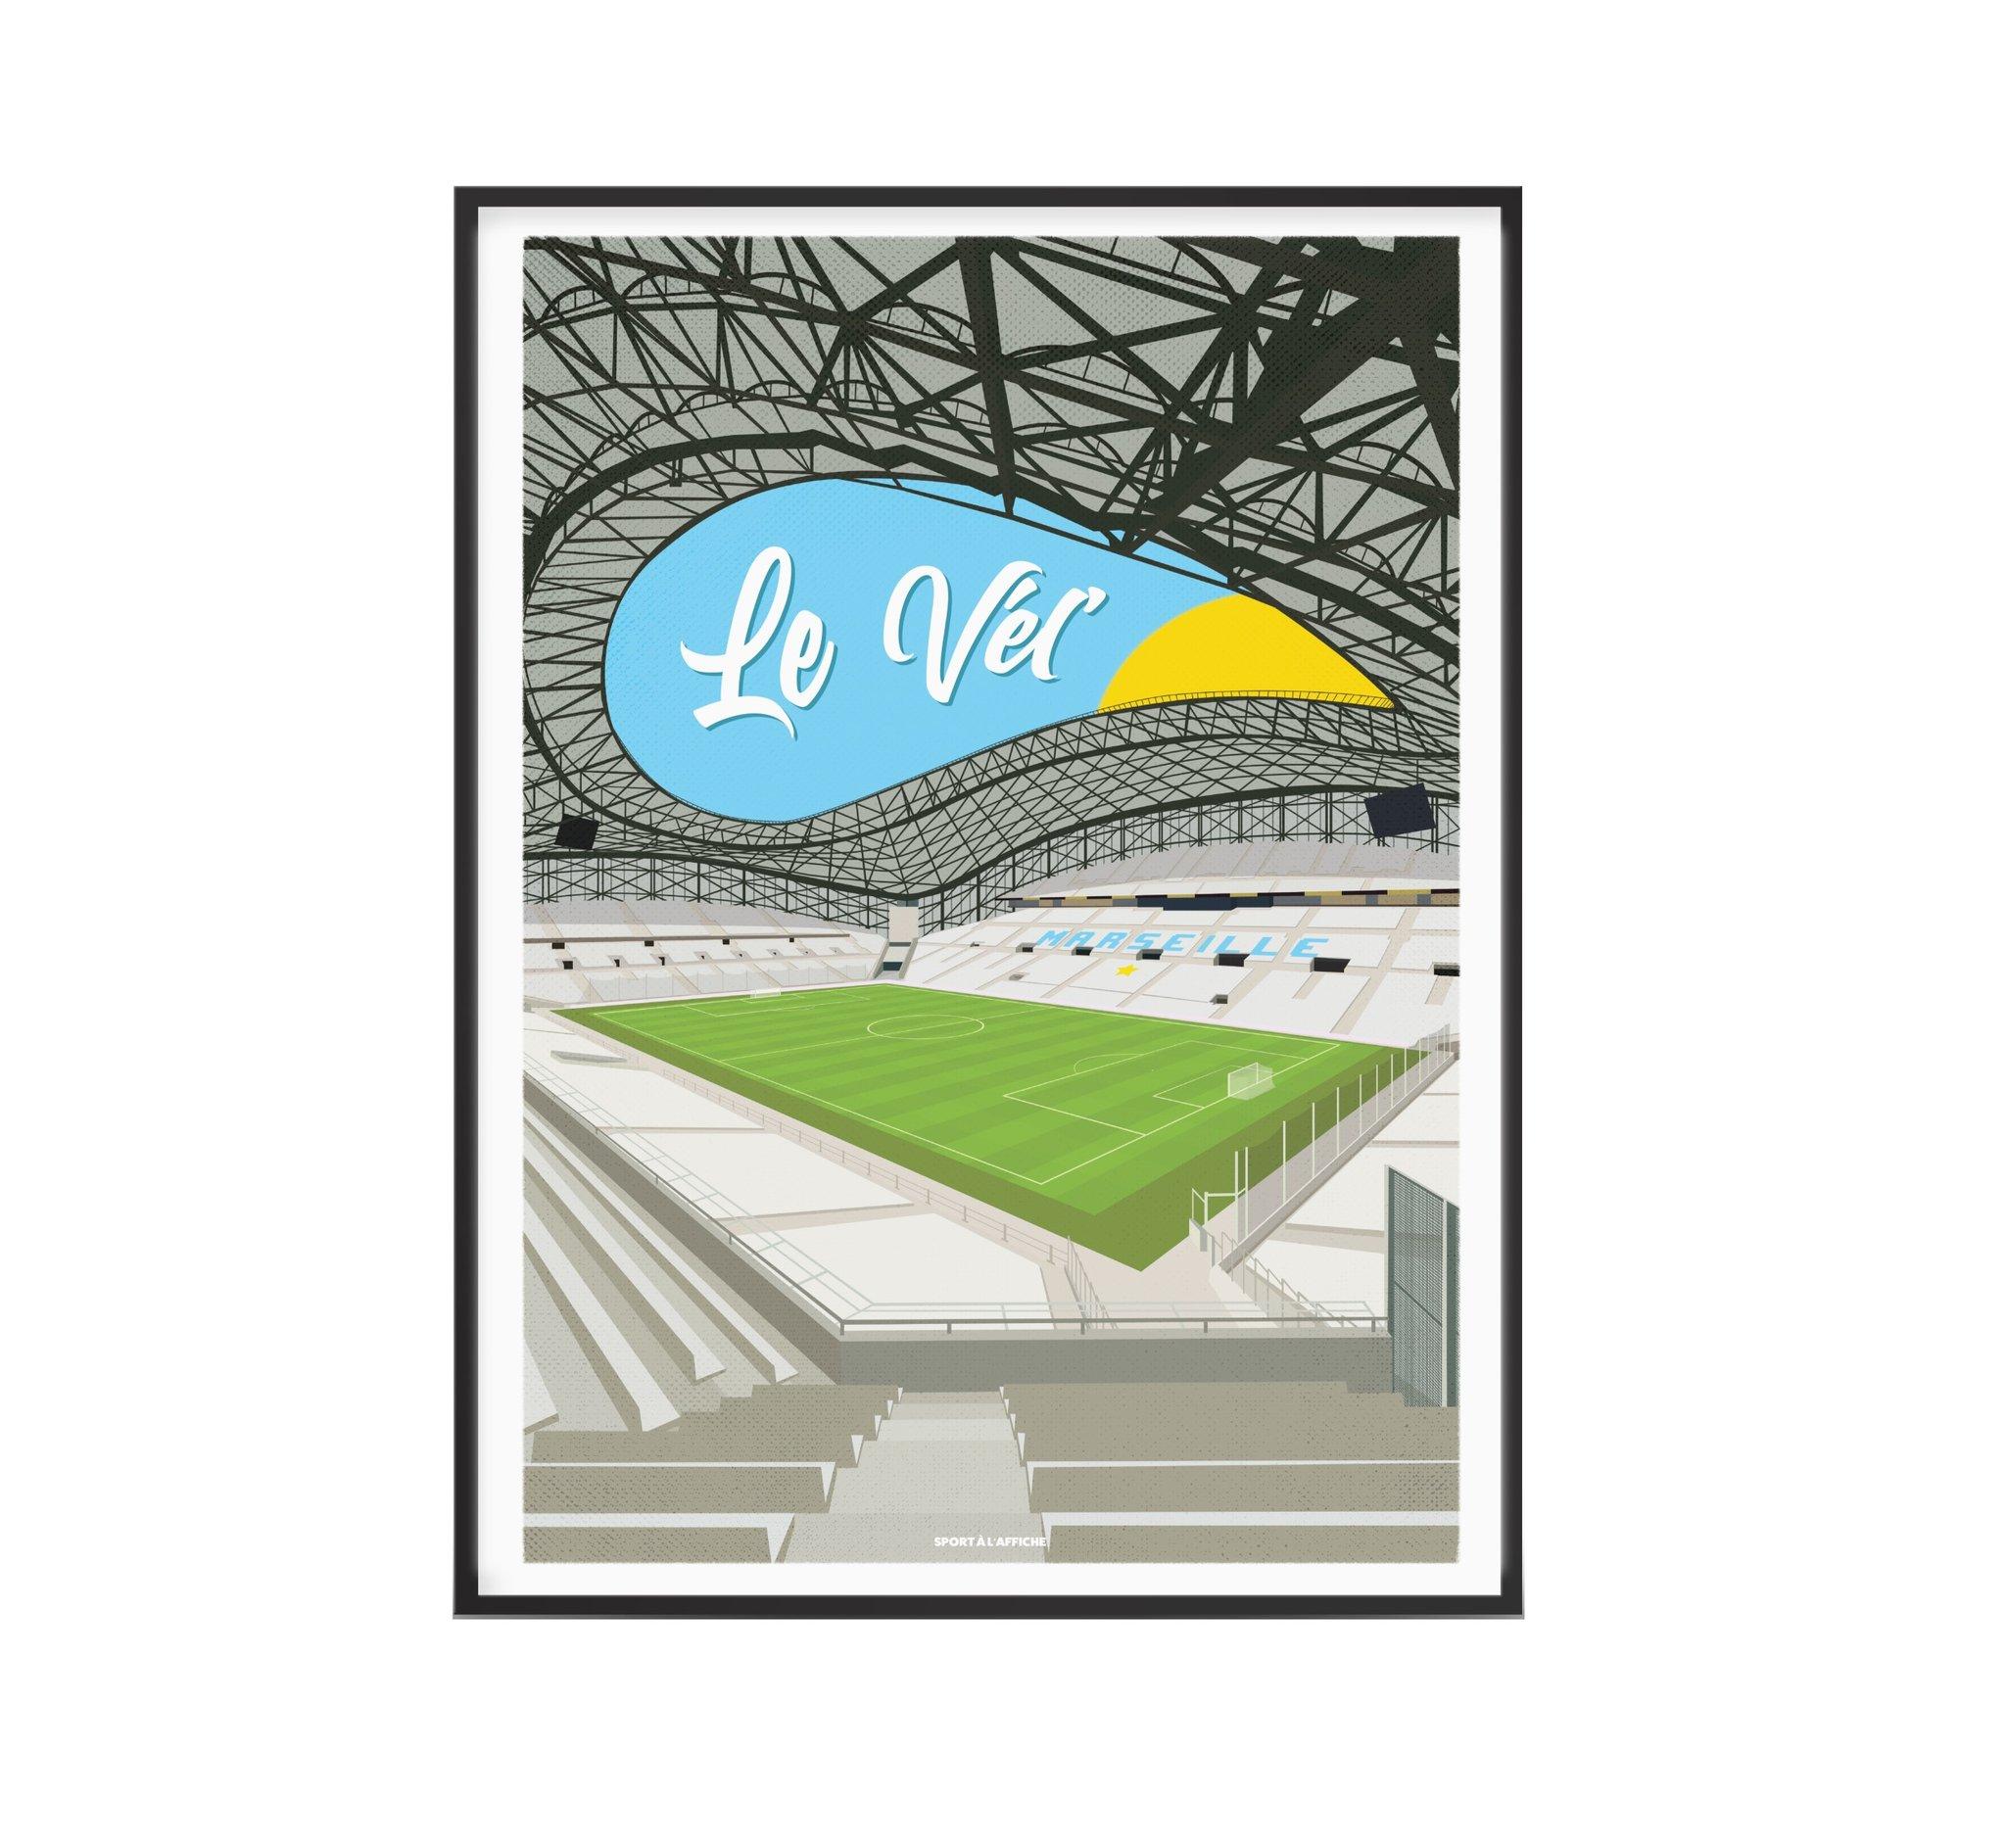 Affiche stade Vélodrome Marseille 40x60 cm